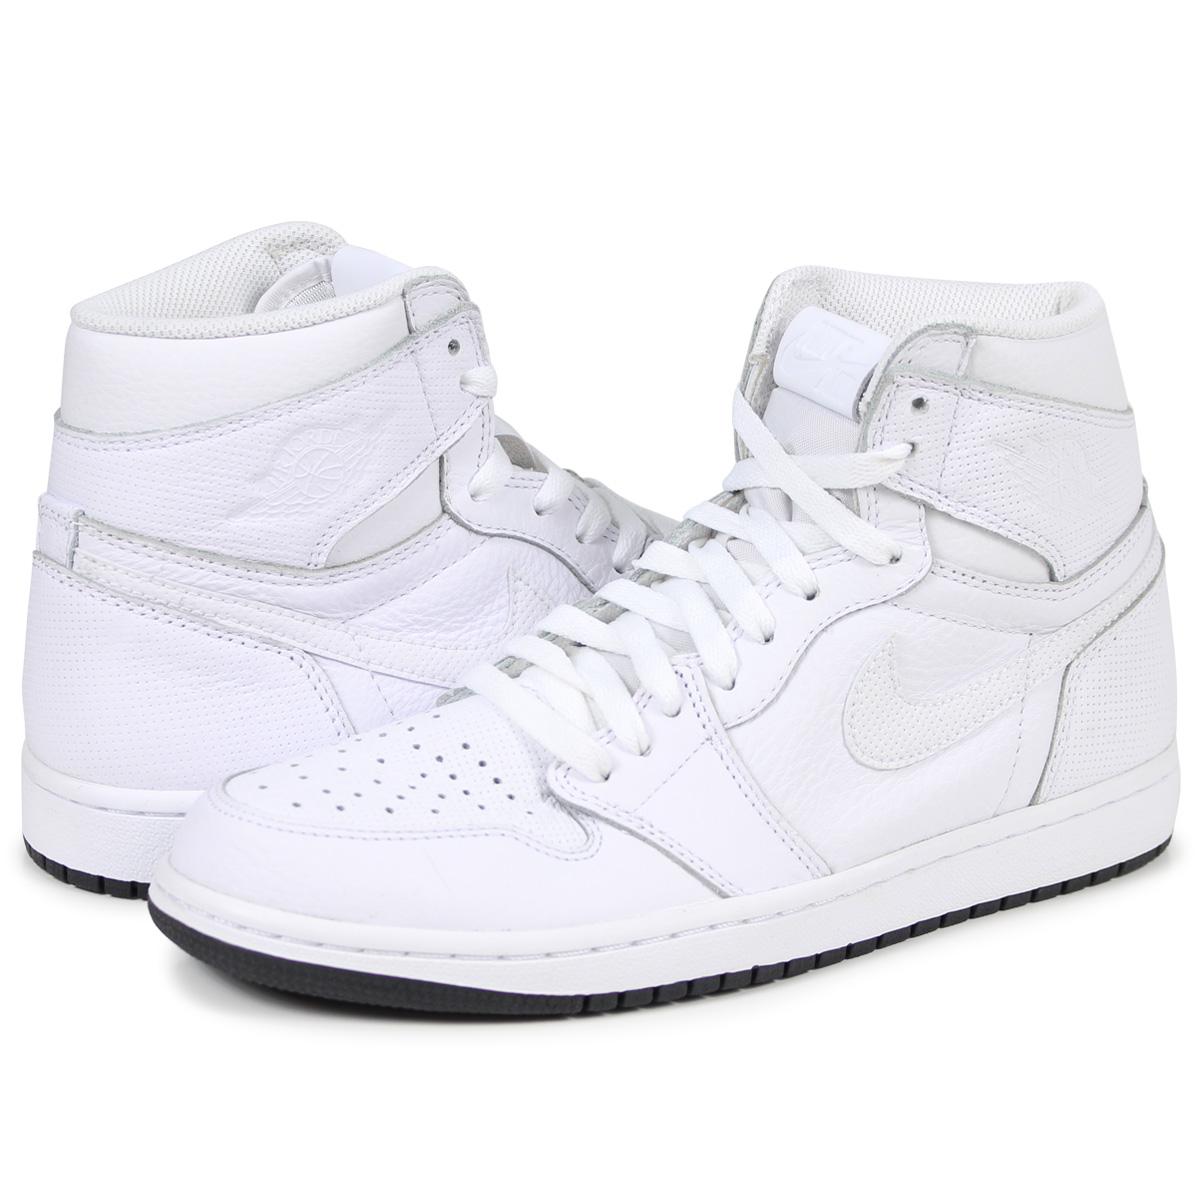 sports shoes b3bde 89ddb NIKE AIR JORDAN 1 RETRO HIGH OG Nike Air Jordan 1 nostalgic high sneakers men  555,088-100 white  load planned Shinnyu load in reservation product 3 15 ...